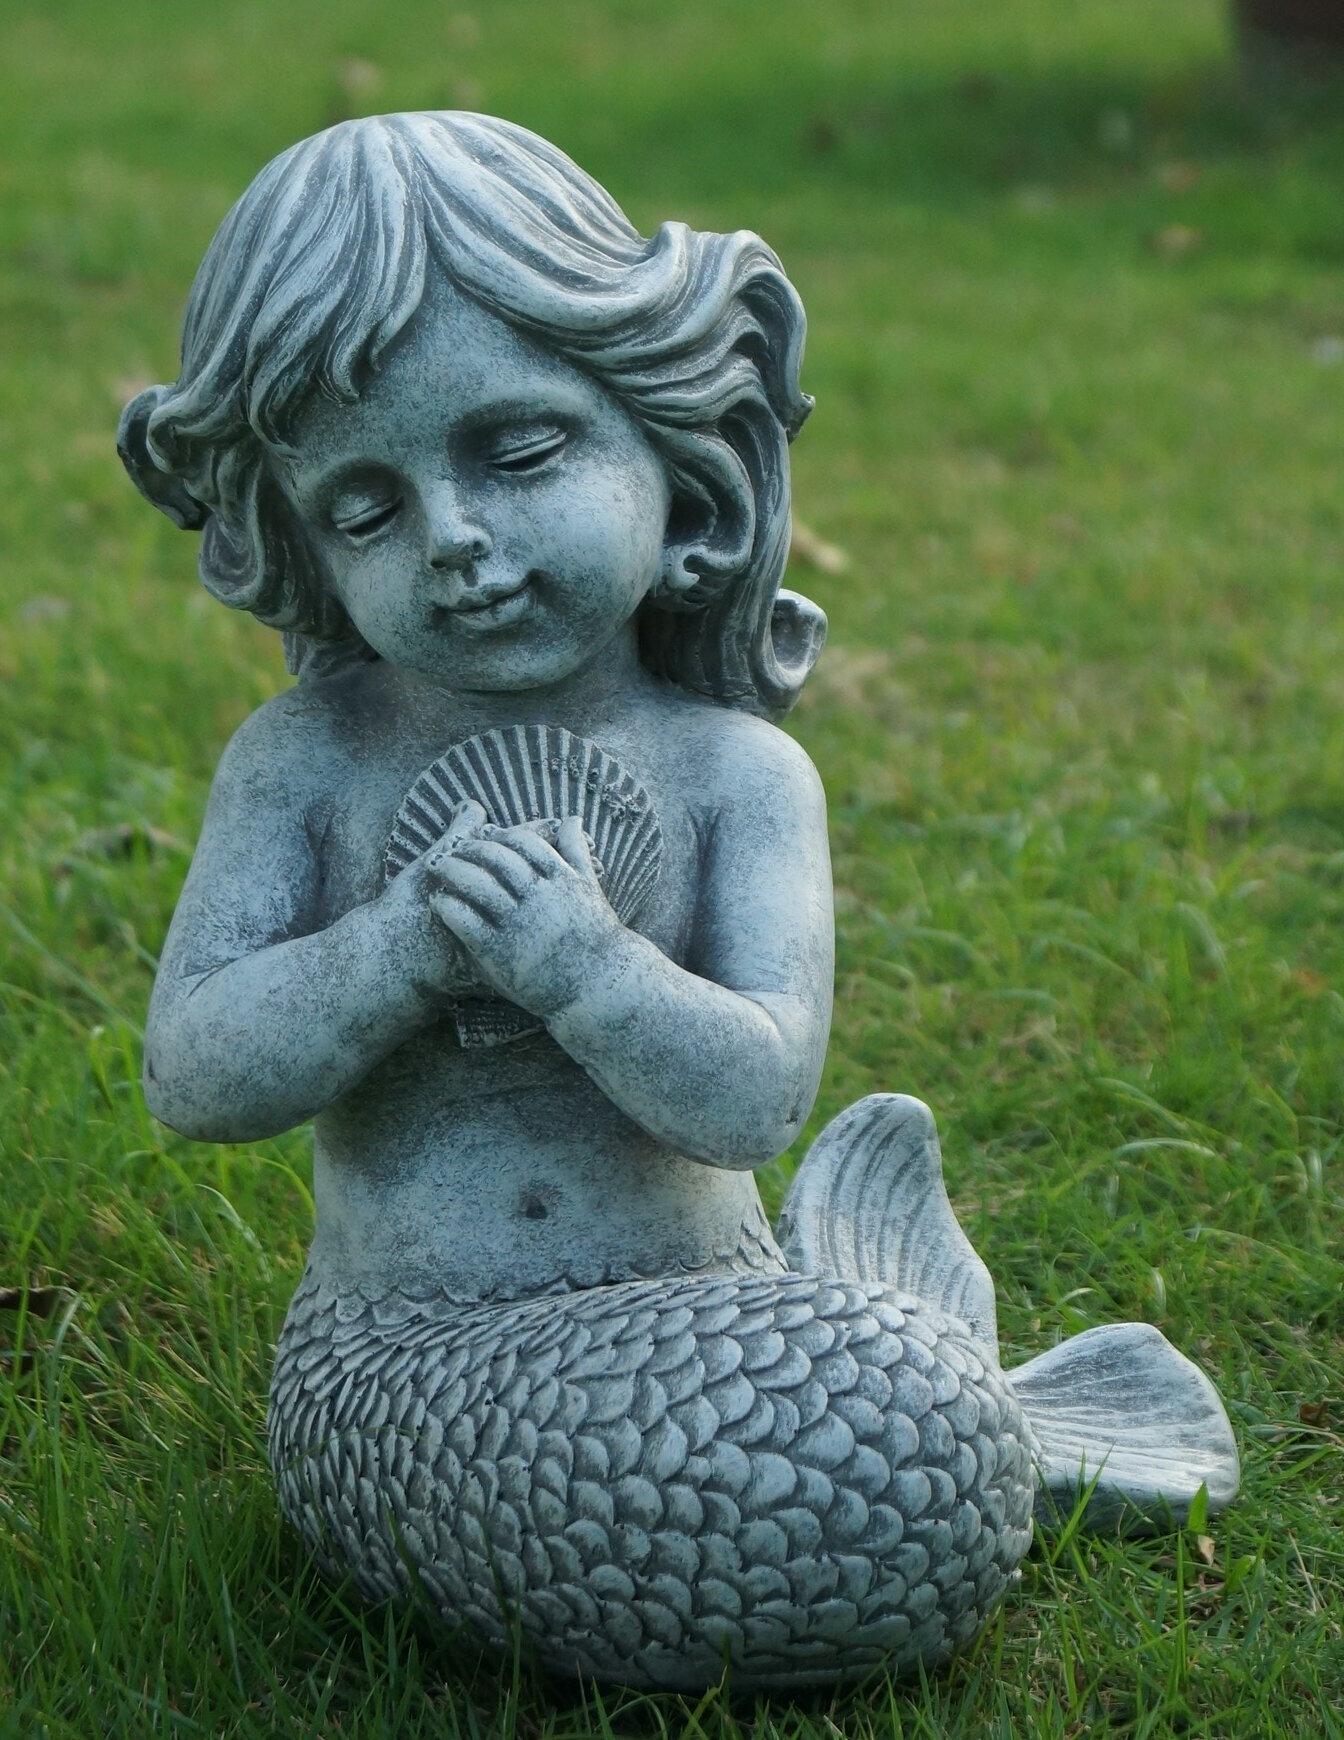 Hi Line Gift Ltd Mermaid Kneeling And Holding Shell Statue Reviews Wayfair